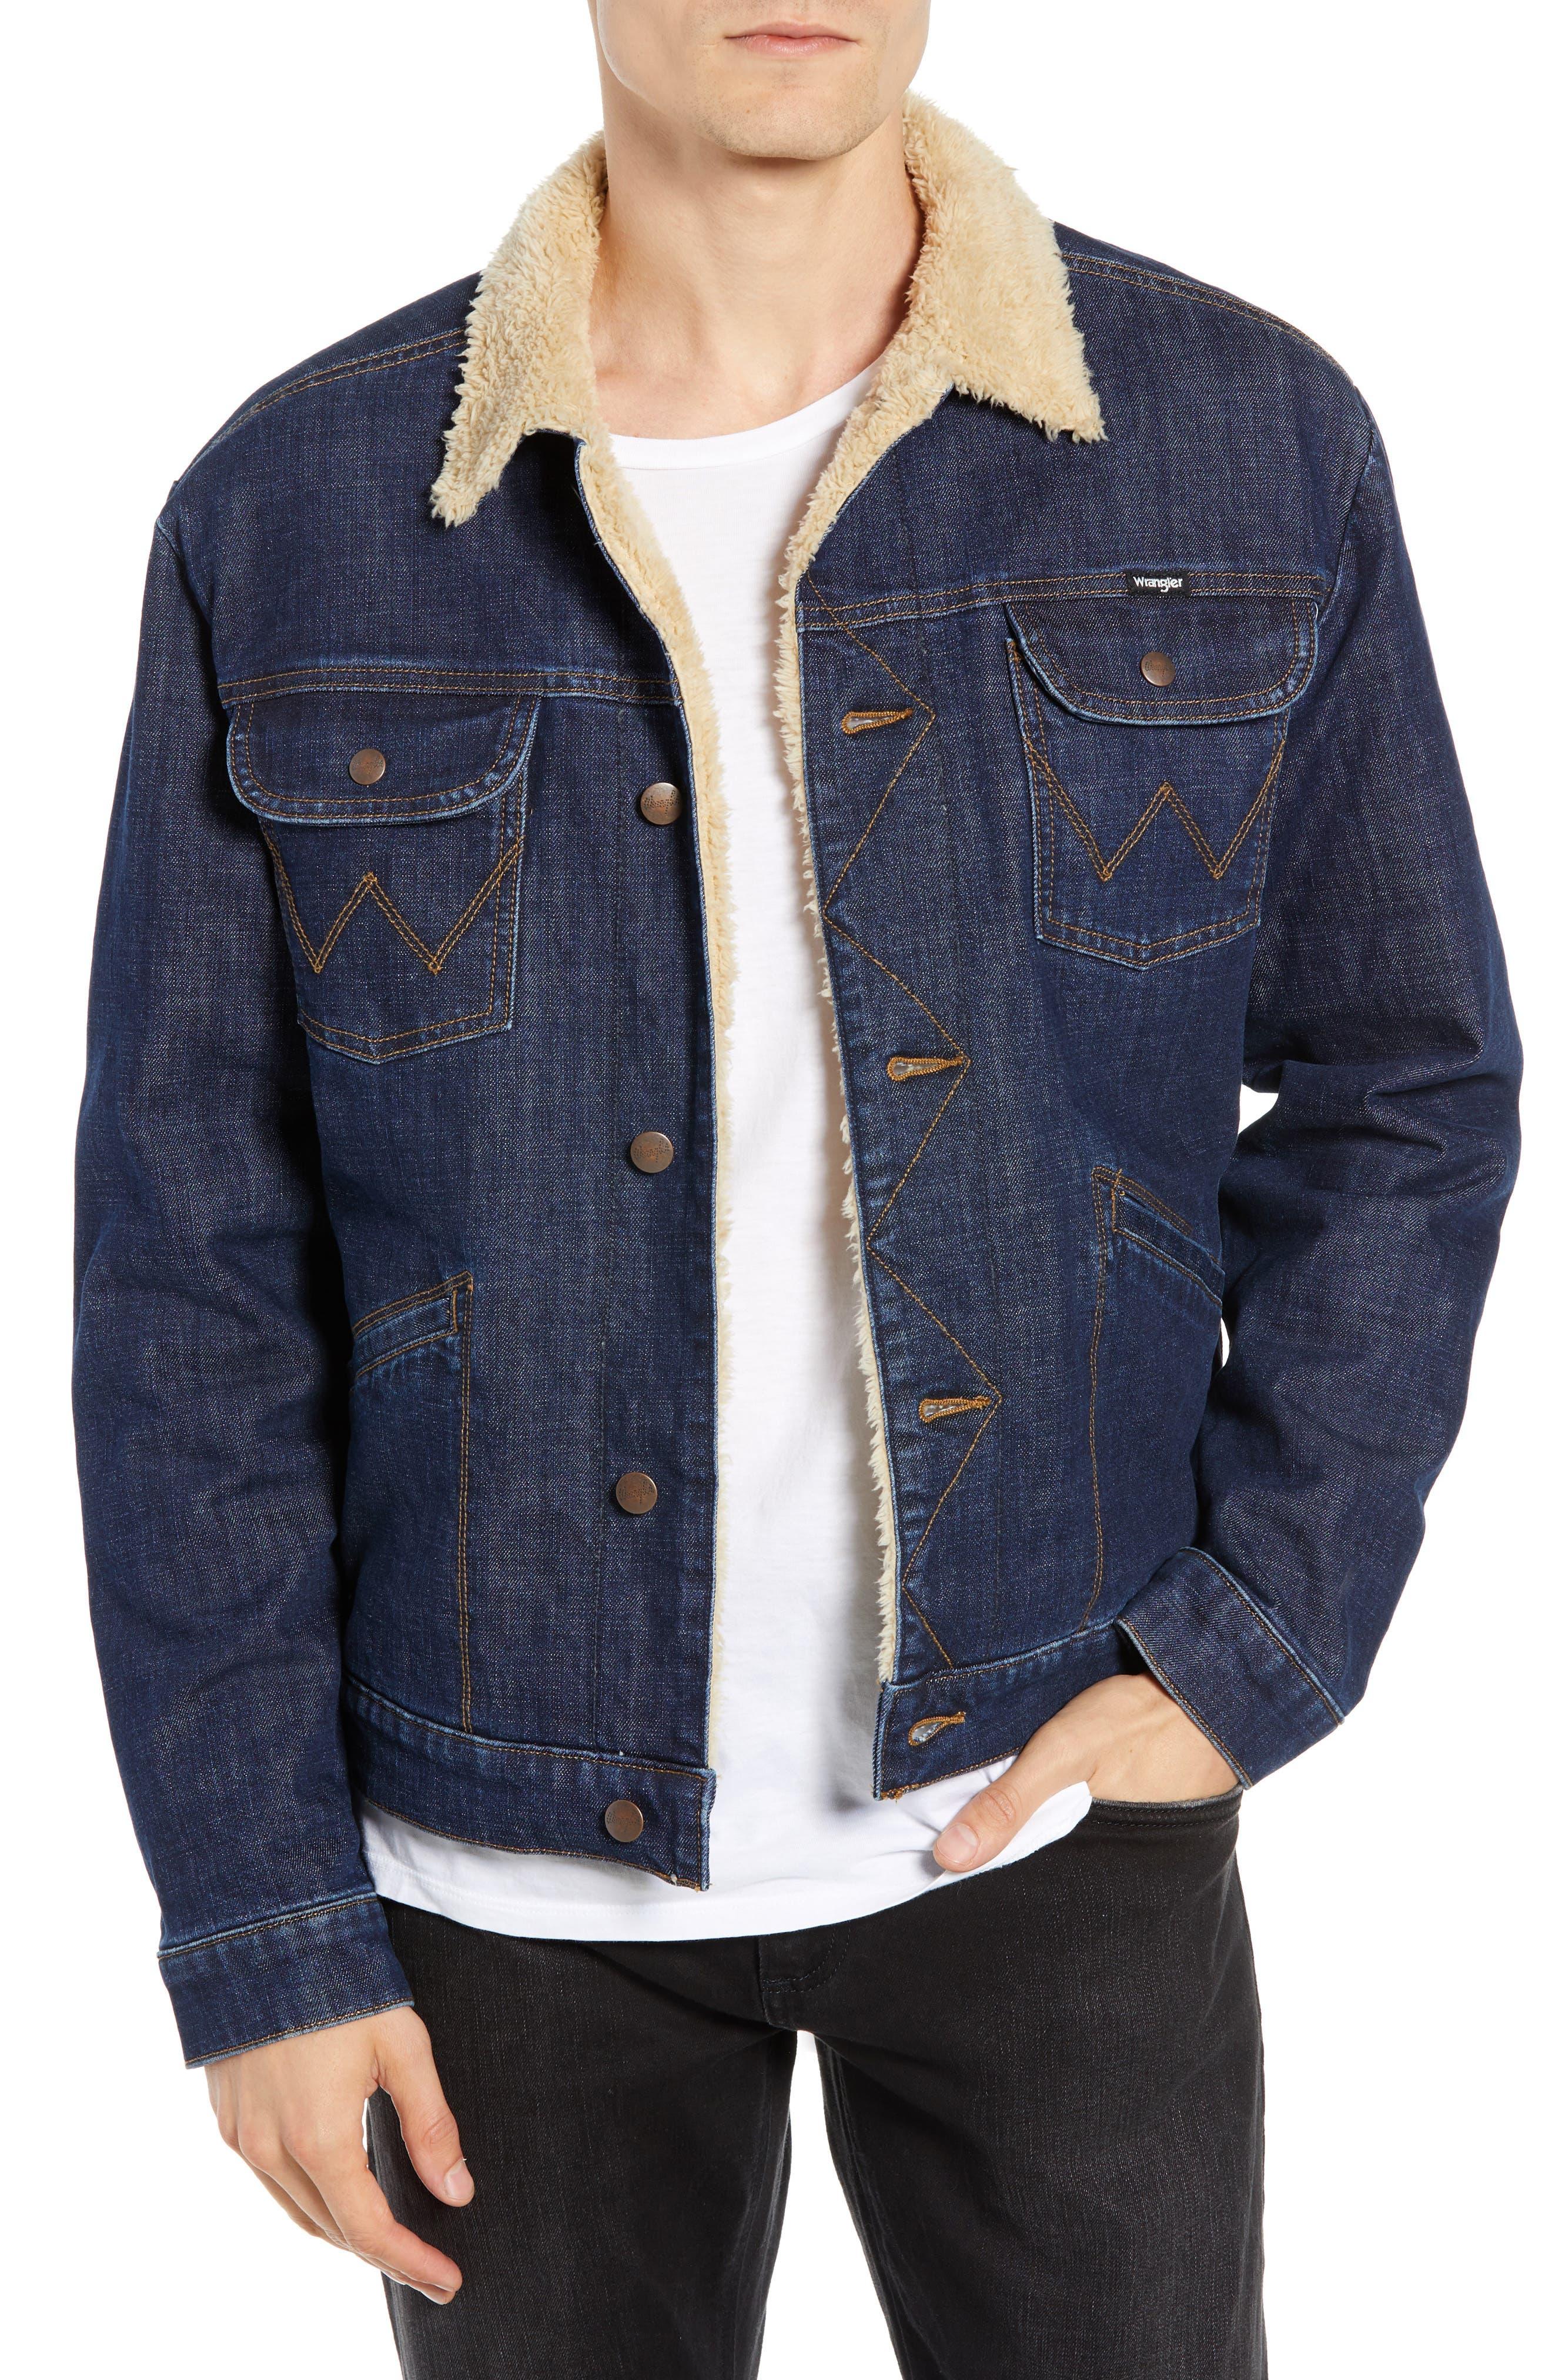 WRANGLER,                             Heritage Fleece Lined Denim Jacket,                             Main thumbnail 1, color,                             DARK